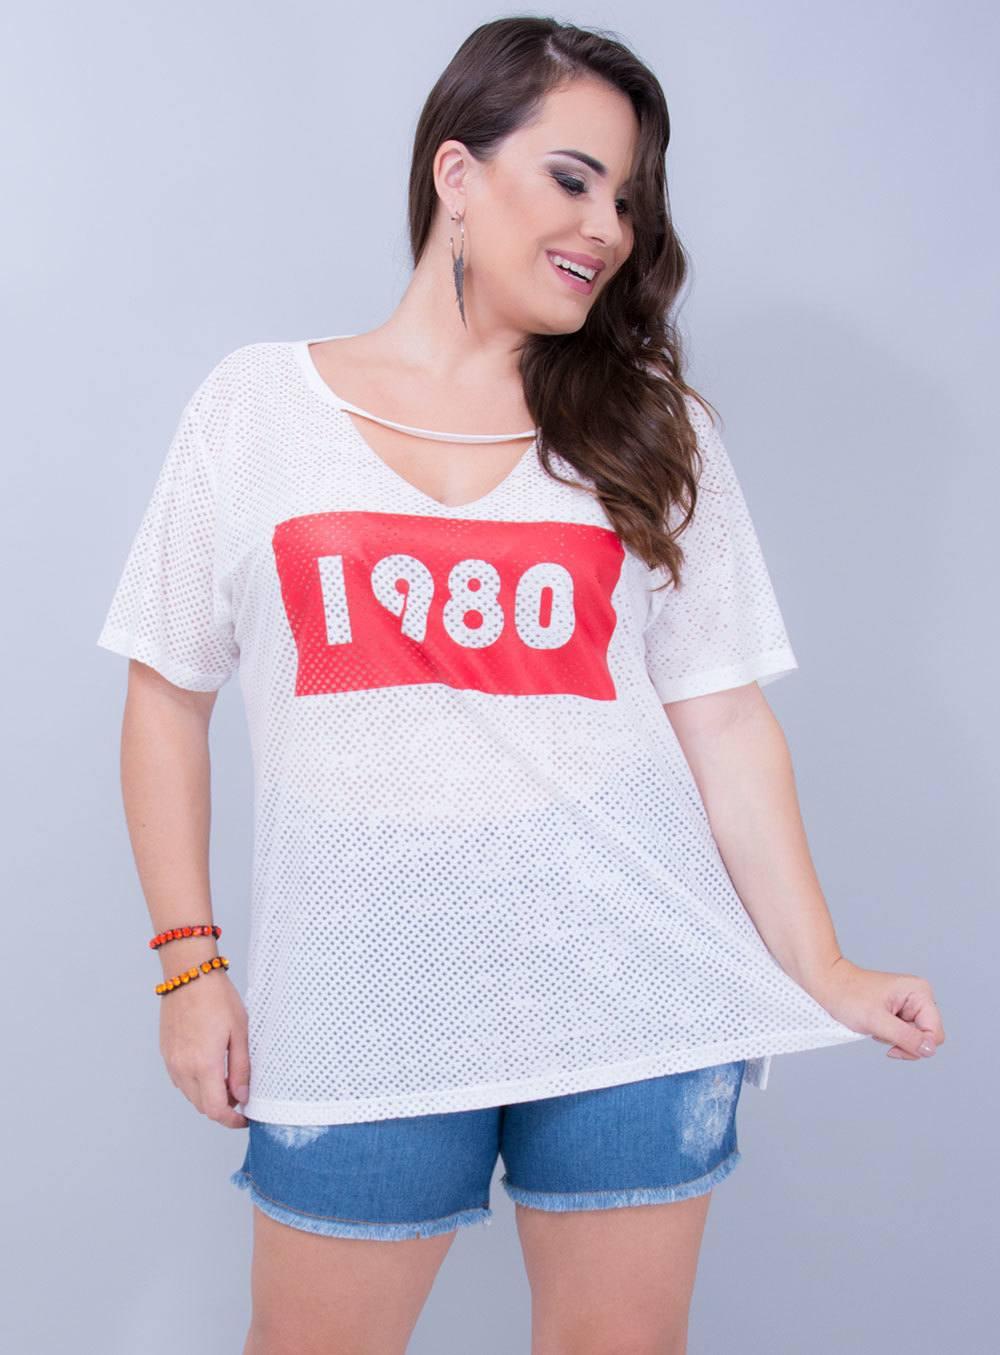 T-shirt em Malha Podrinha 1980 Chocker Branca ref. EL10149